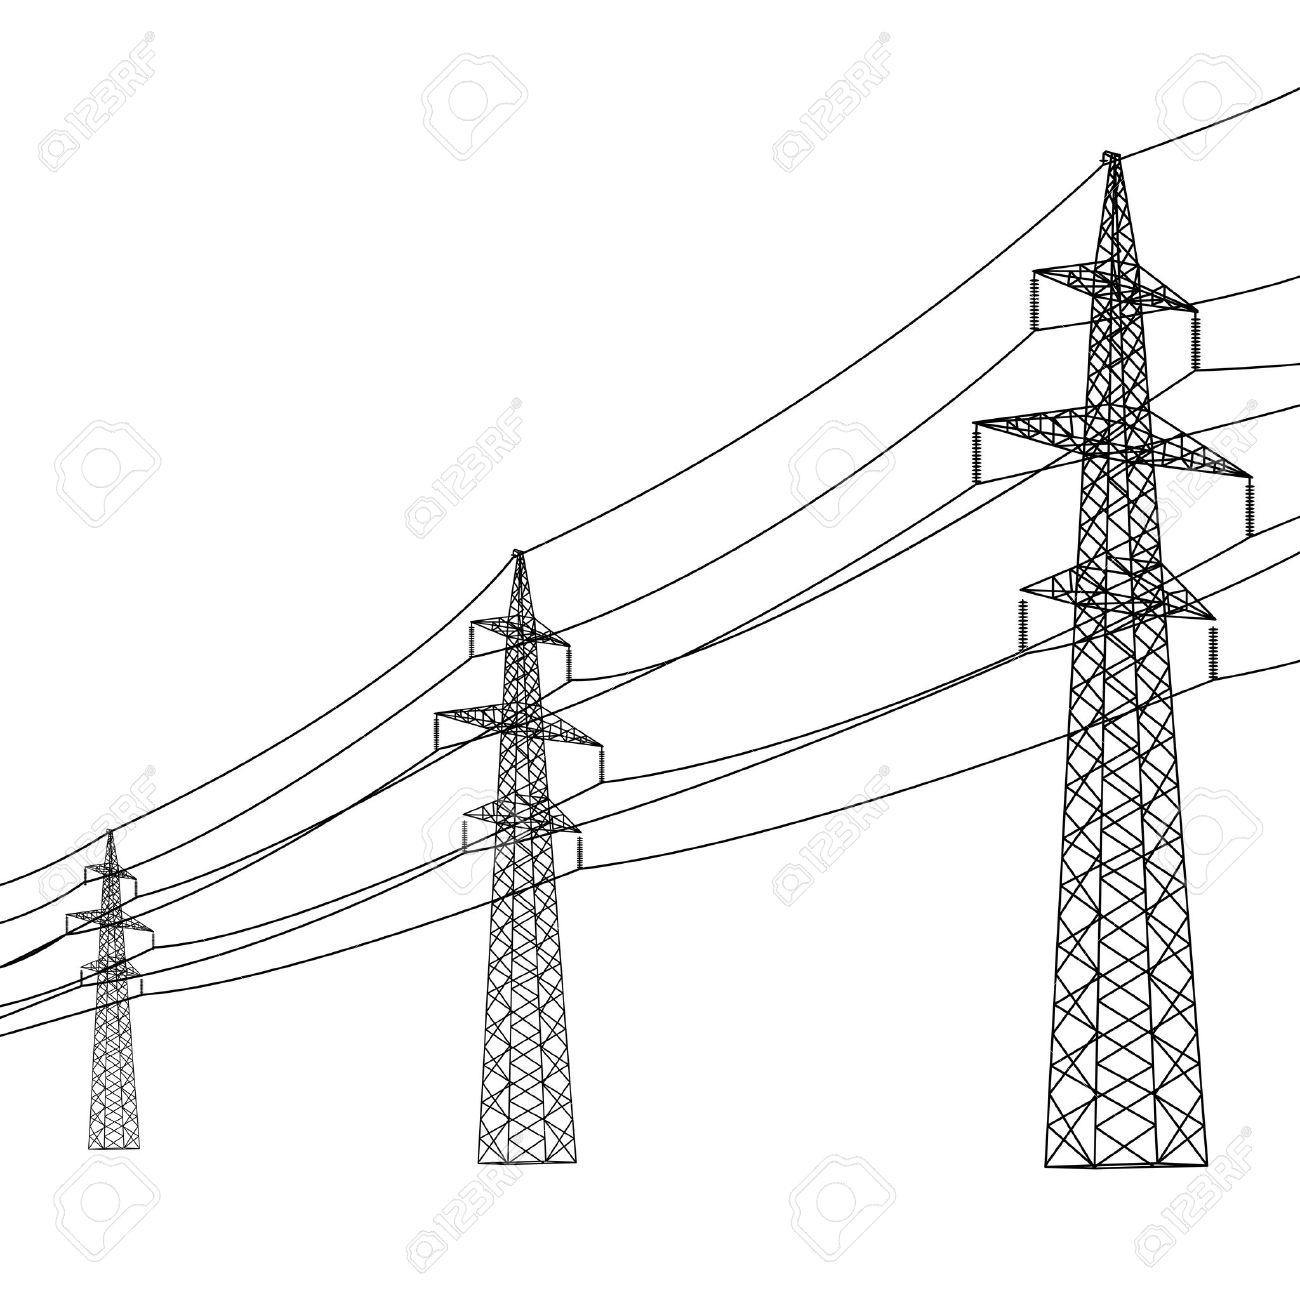 Power Line Drawing At Getdrawings